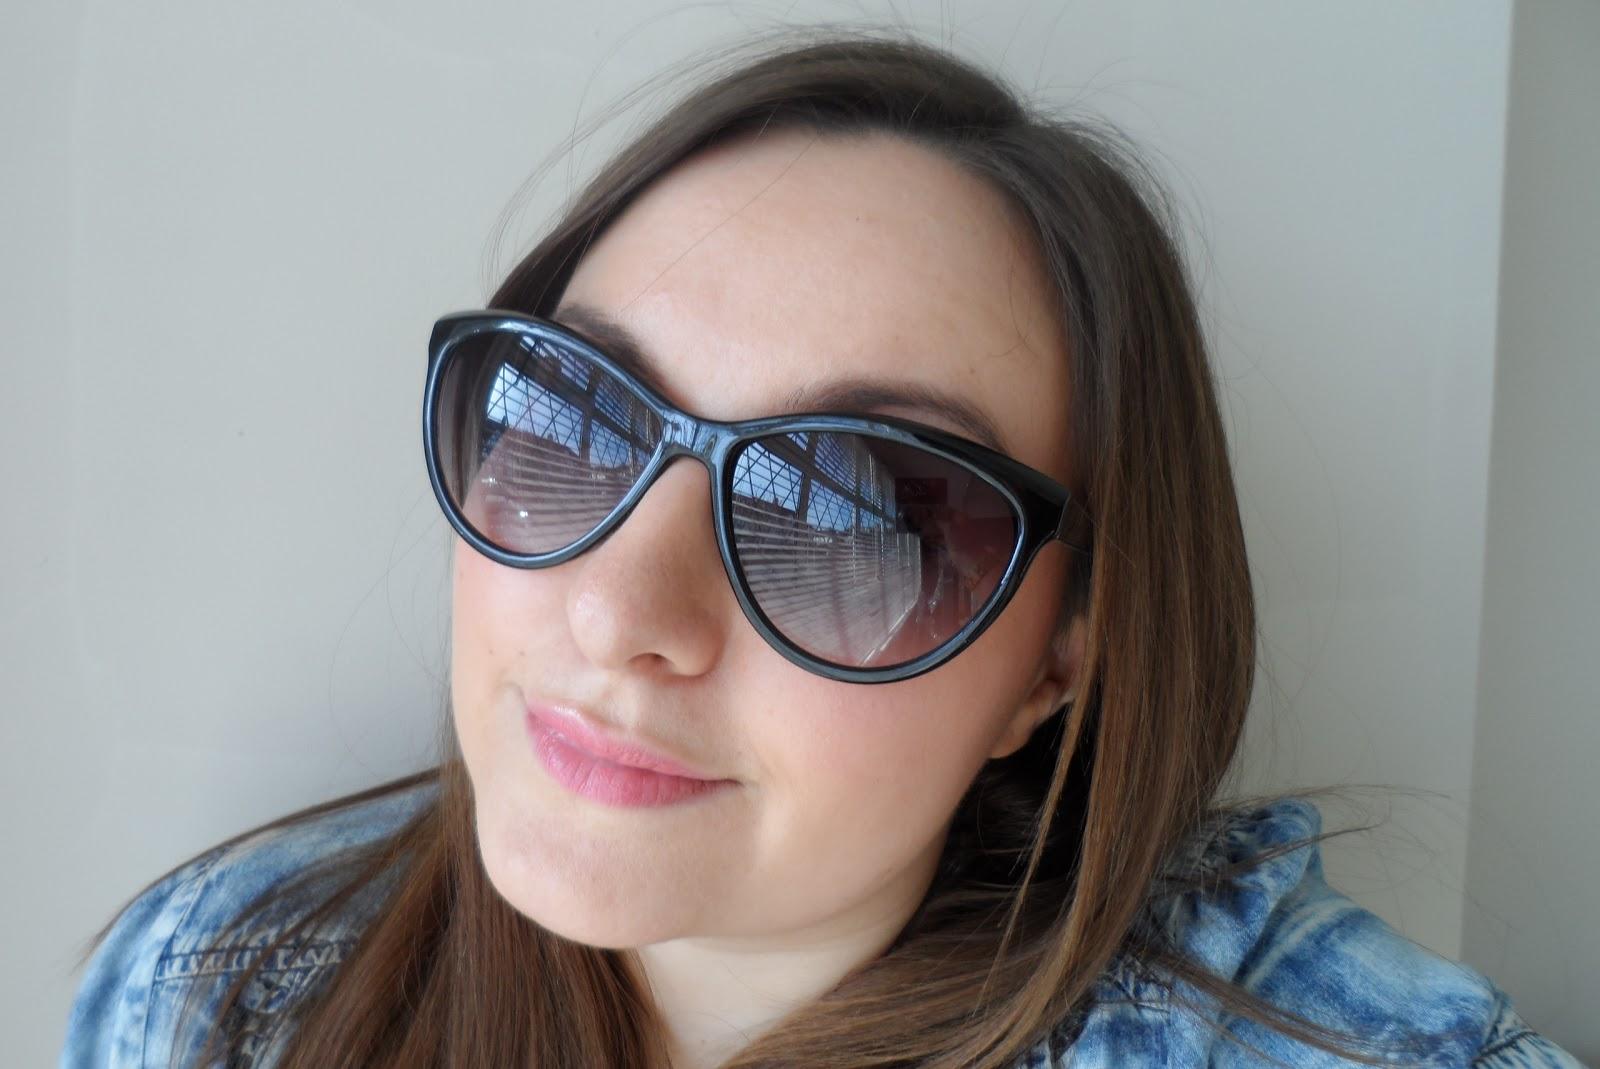 http://3.bp.blogspot.com/-m8KDVmRawL4/T3tw9VyorvI/AAAAAAAAGAQ/wYjfLzoXthY/s1600/h&m+hm+hennes+cat+eye+rayban+ray+ban+shape+sunglasses+black+snake+print+catban+catbans.JPG